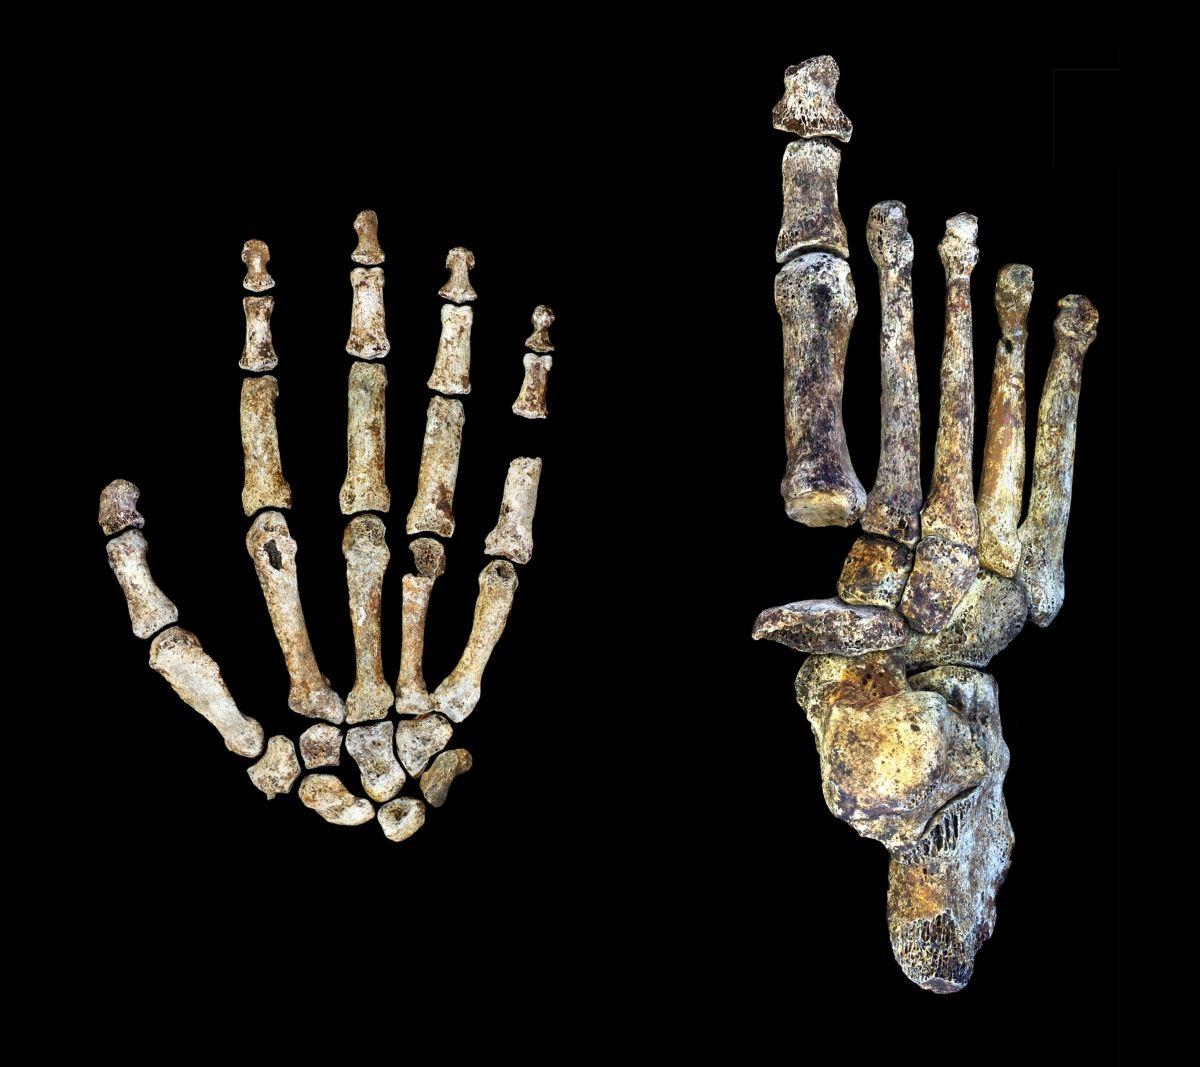 Homo naledi hand and foot